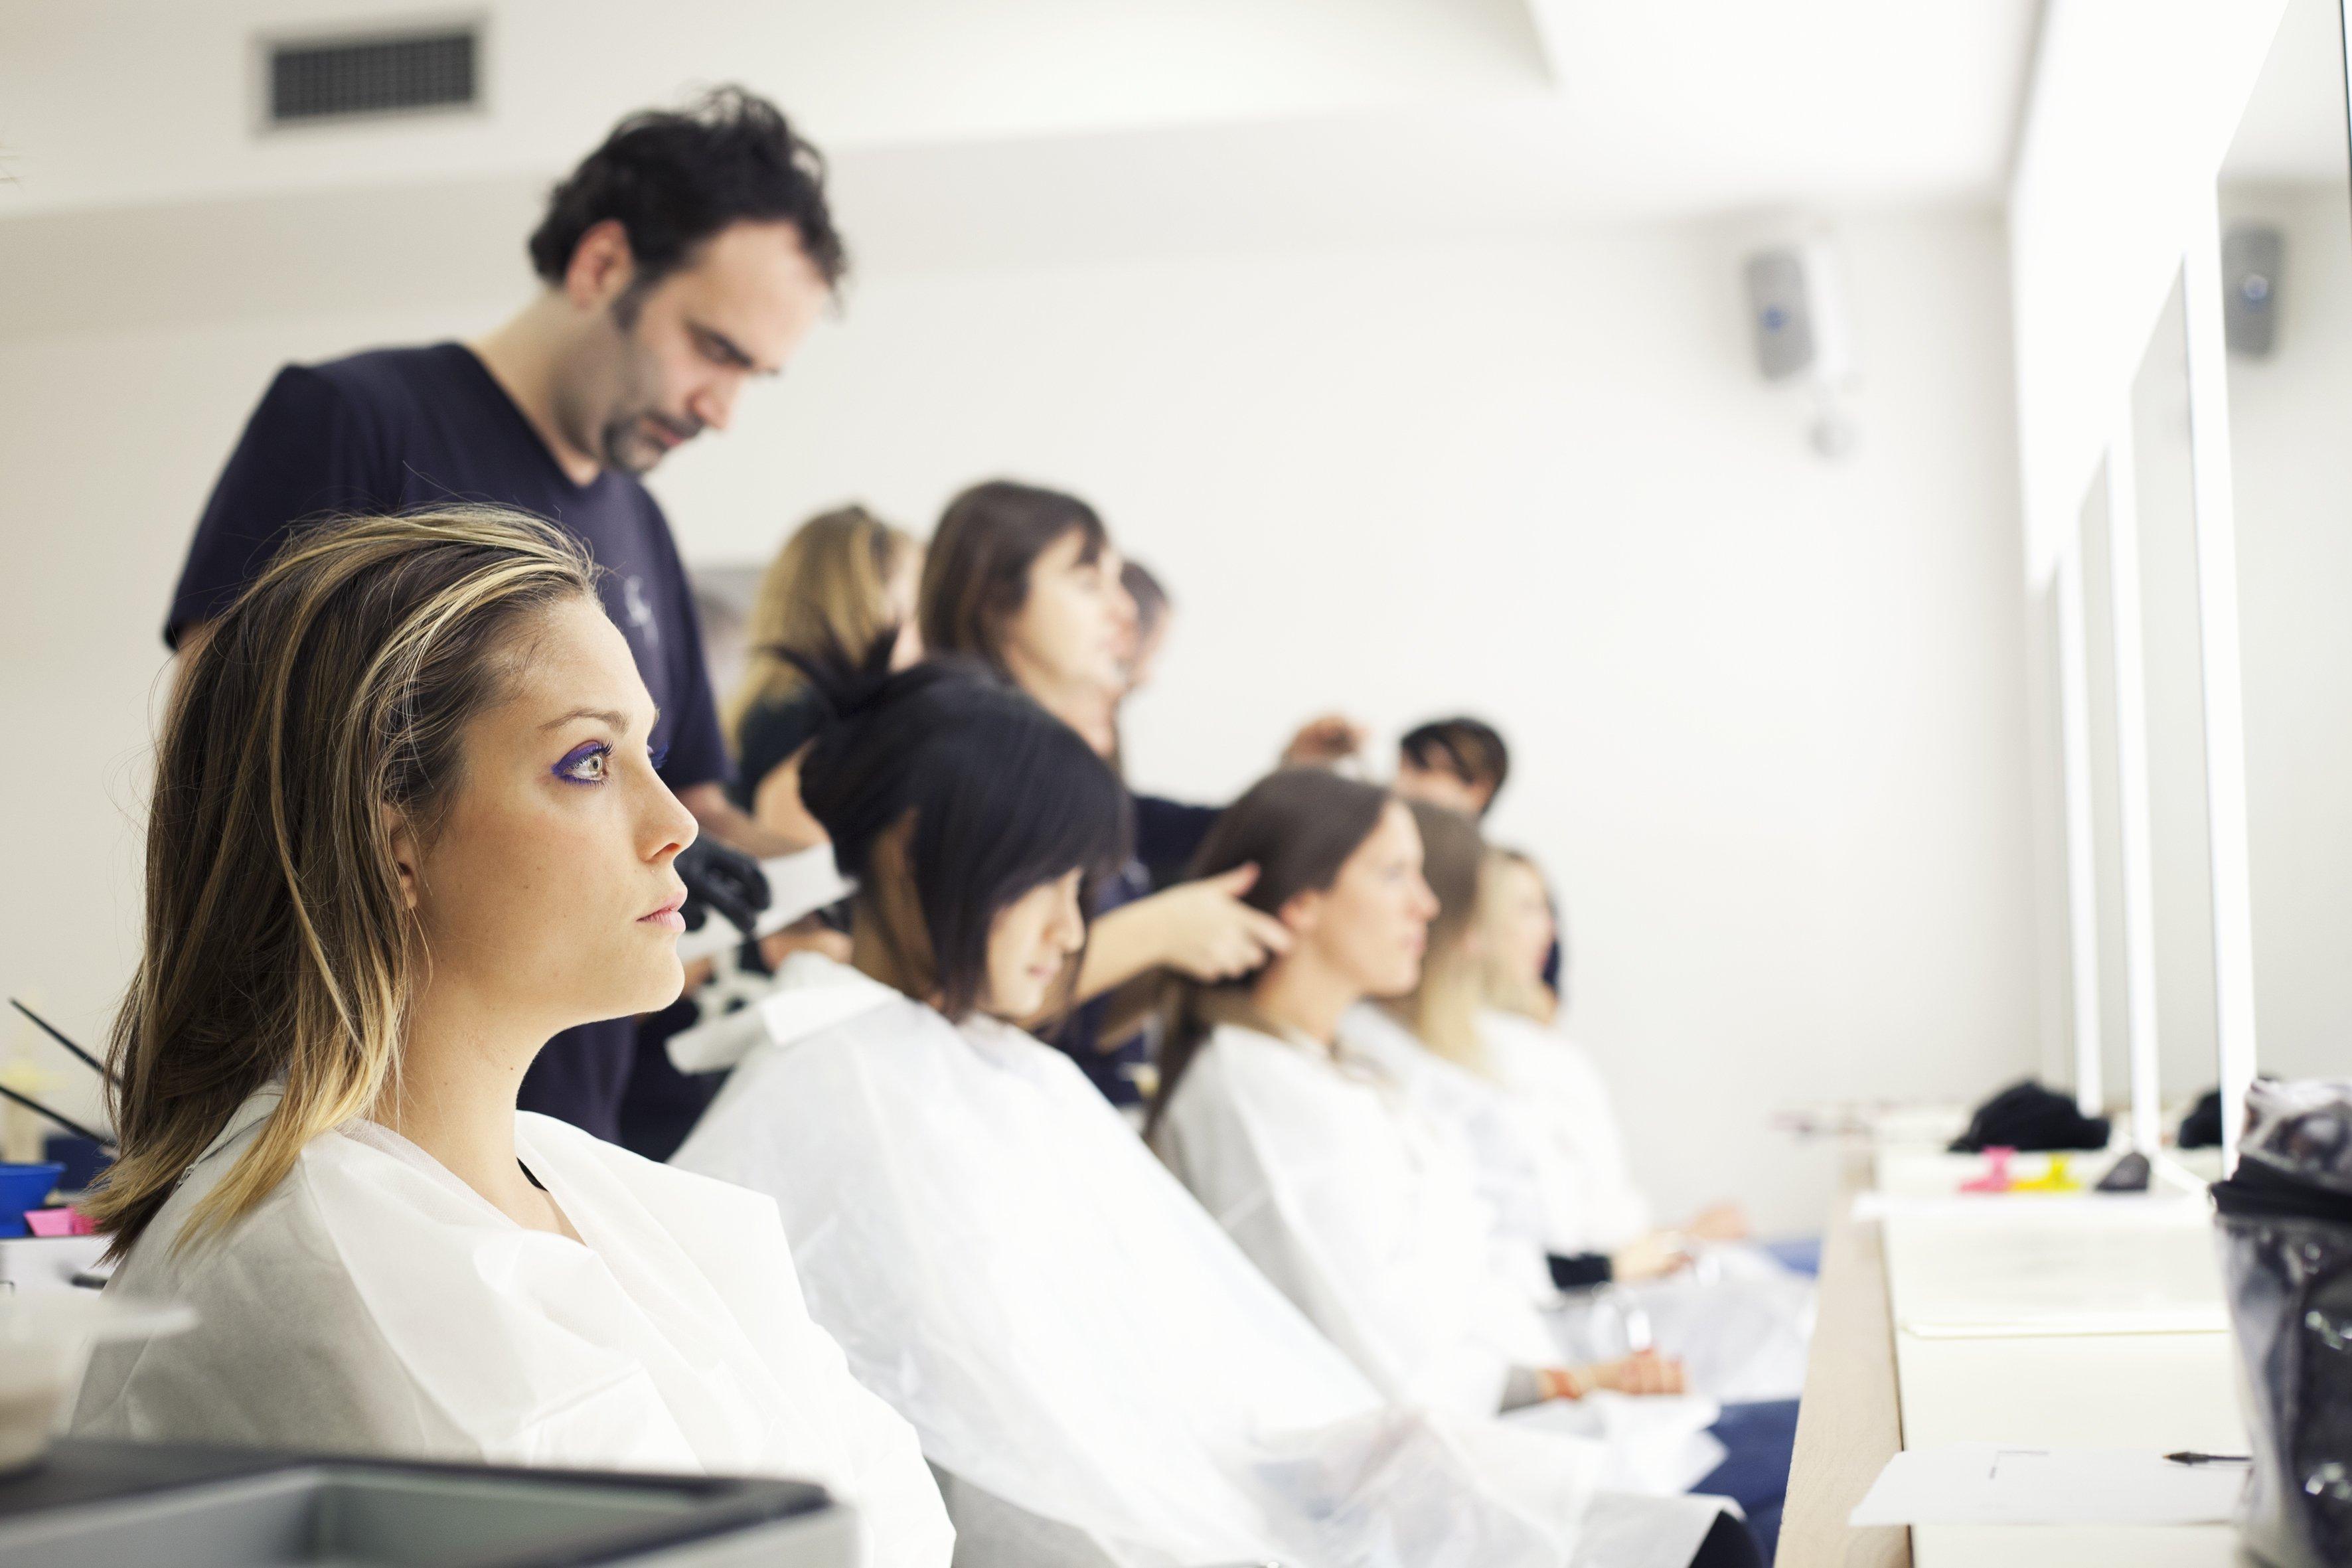 staff del parrucchiere a lavoro